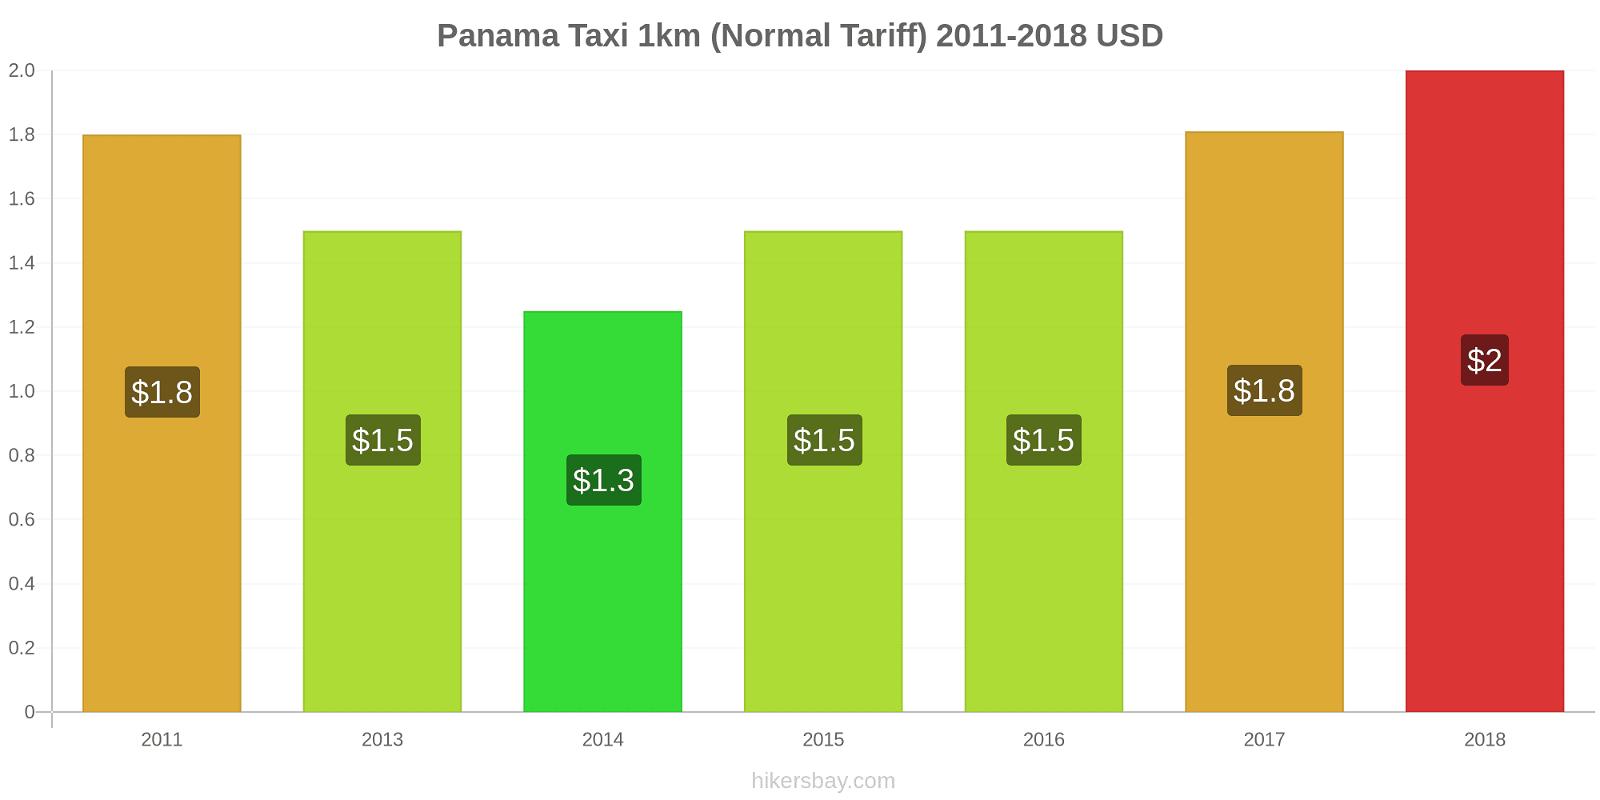 Panama price changes Taxi 1km (Normal Tariff) hikersbay.com